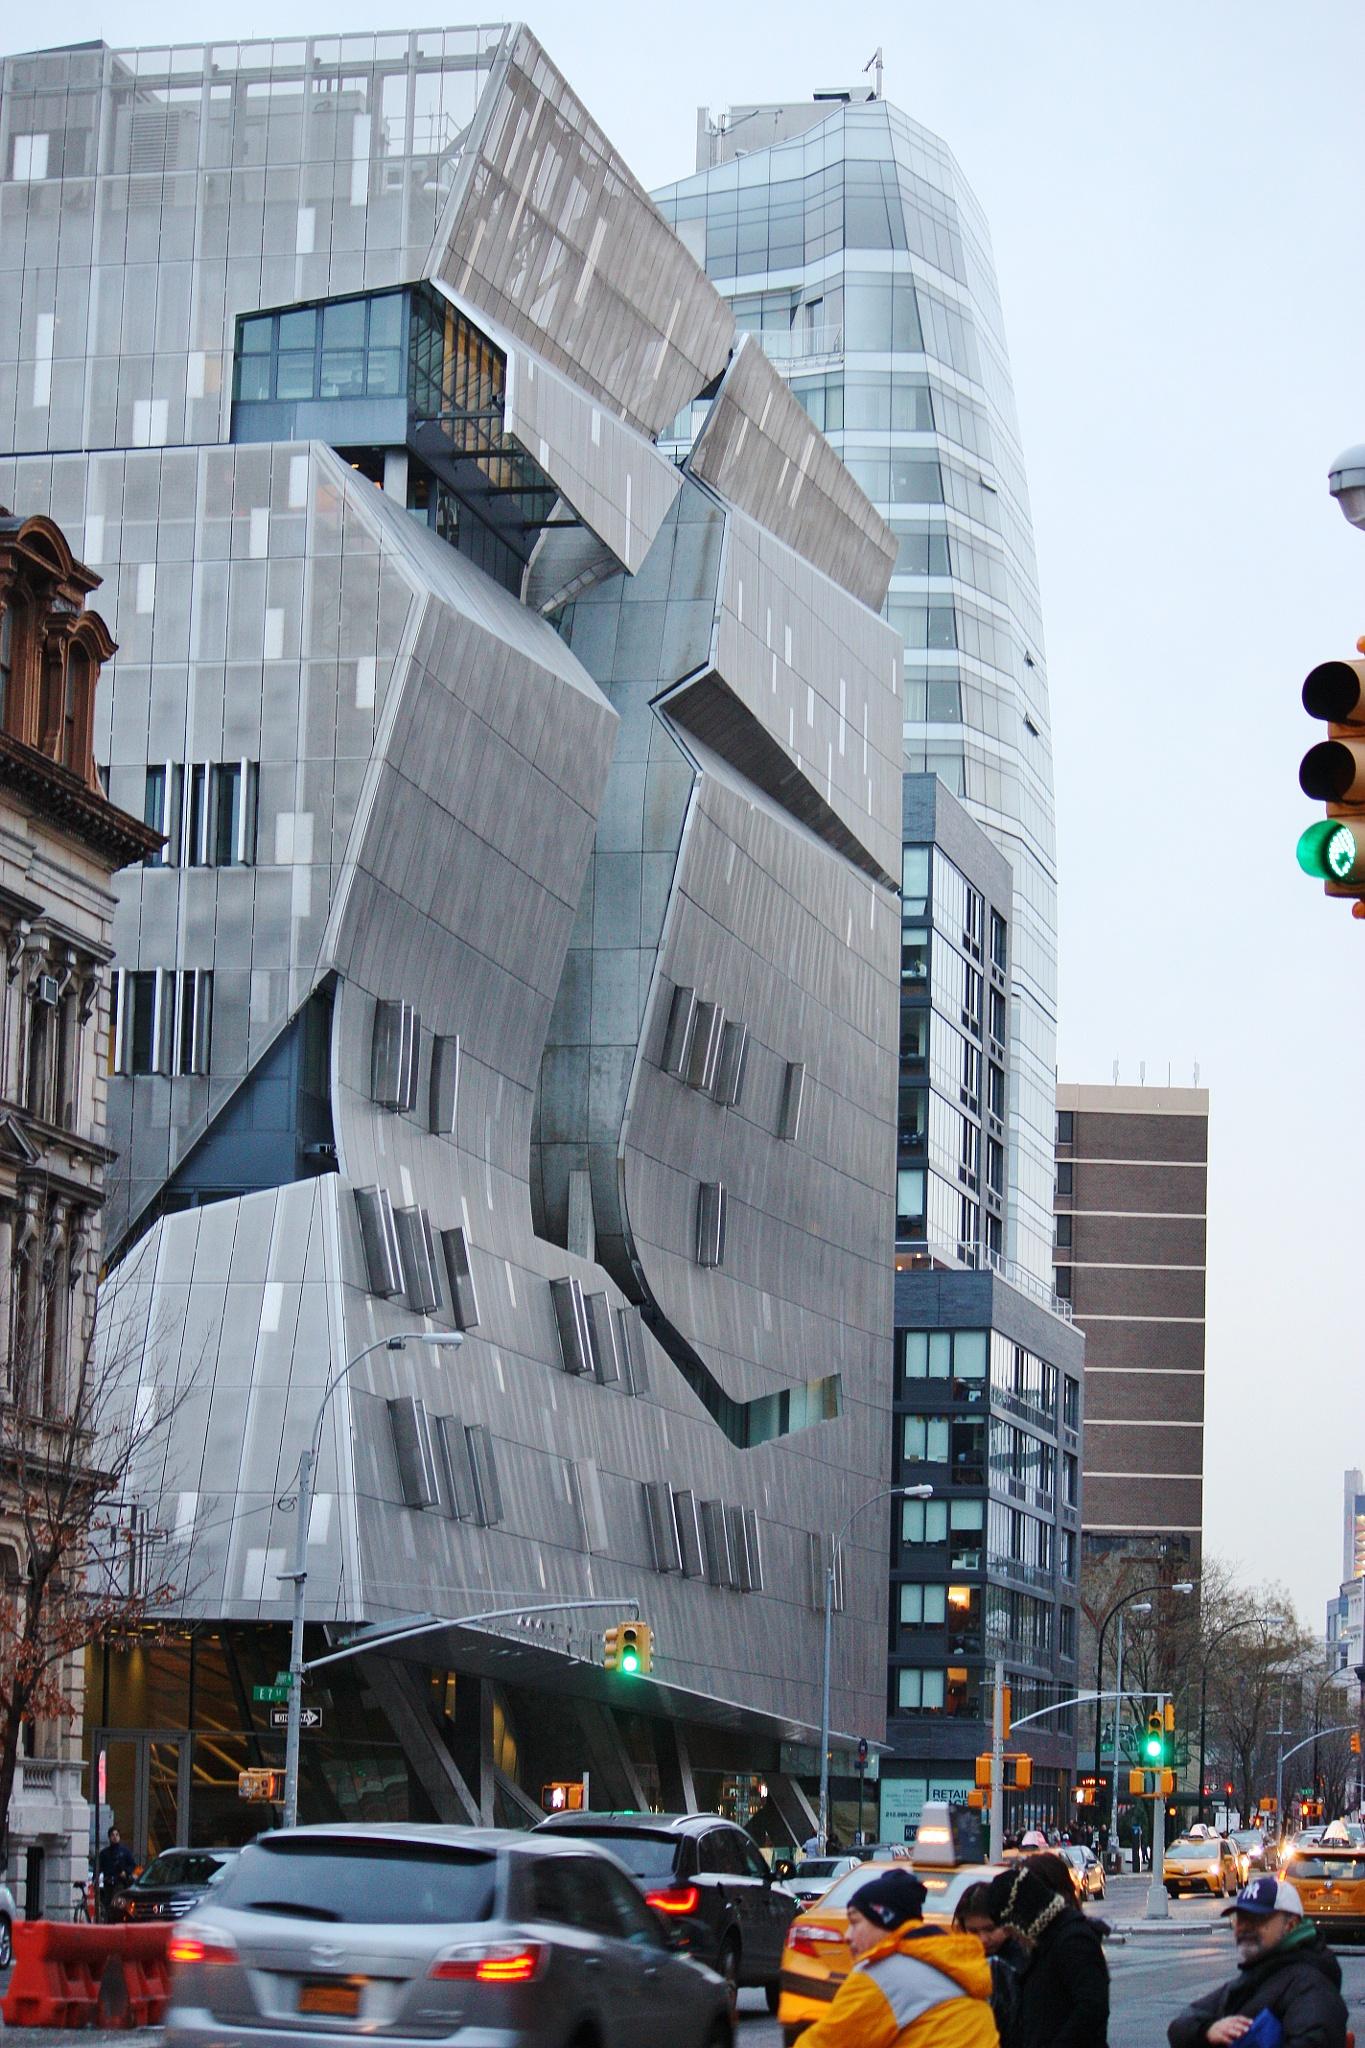 Architecture NY, by Liborio Drogo